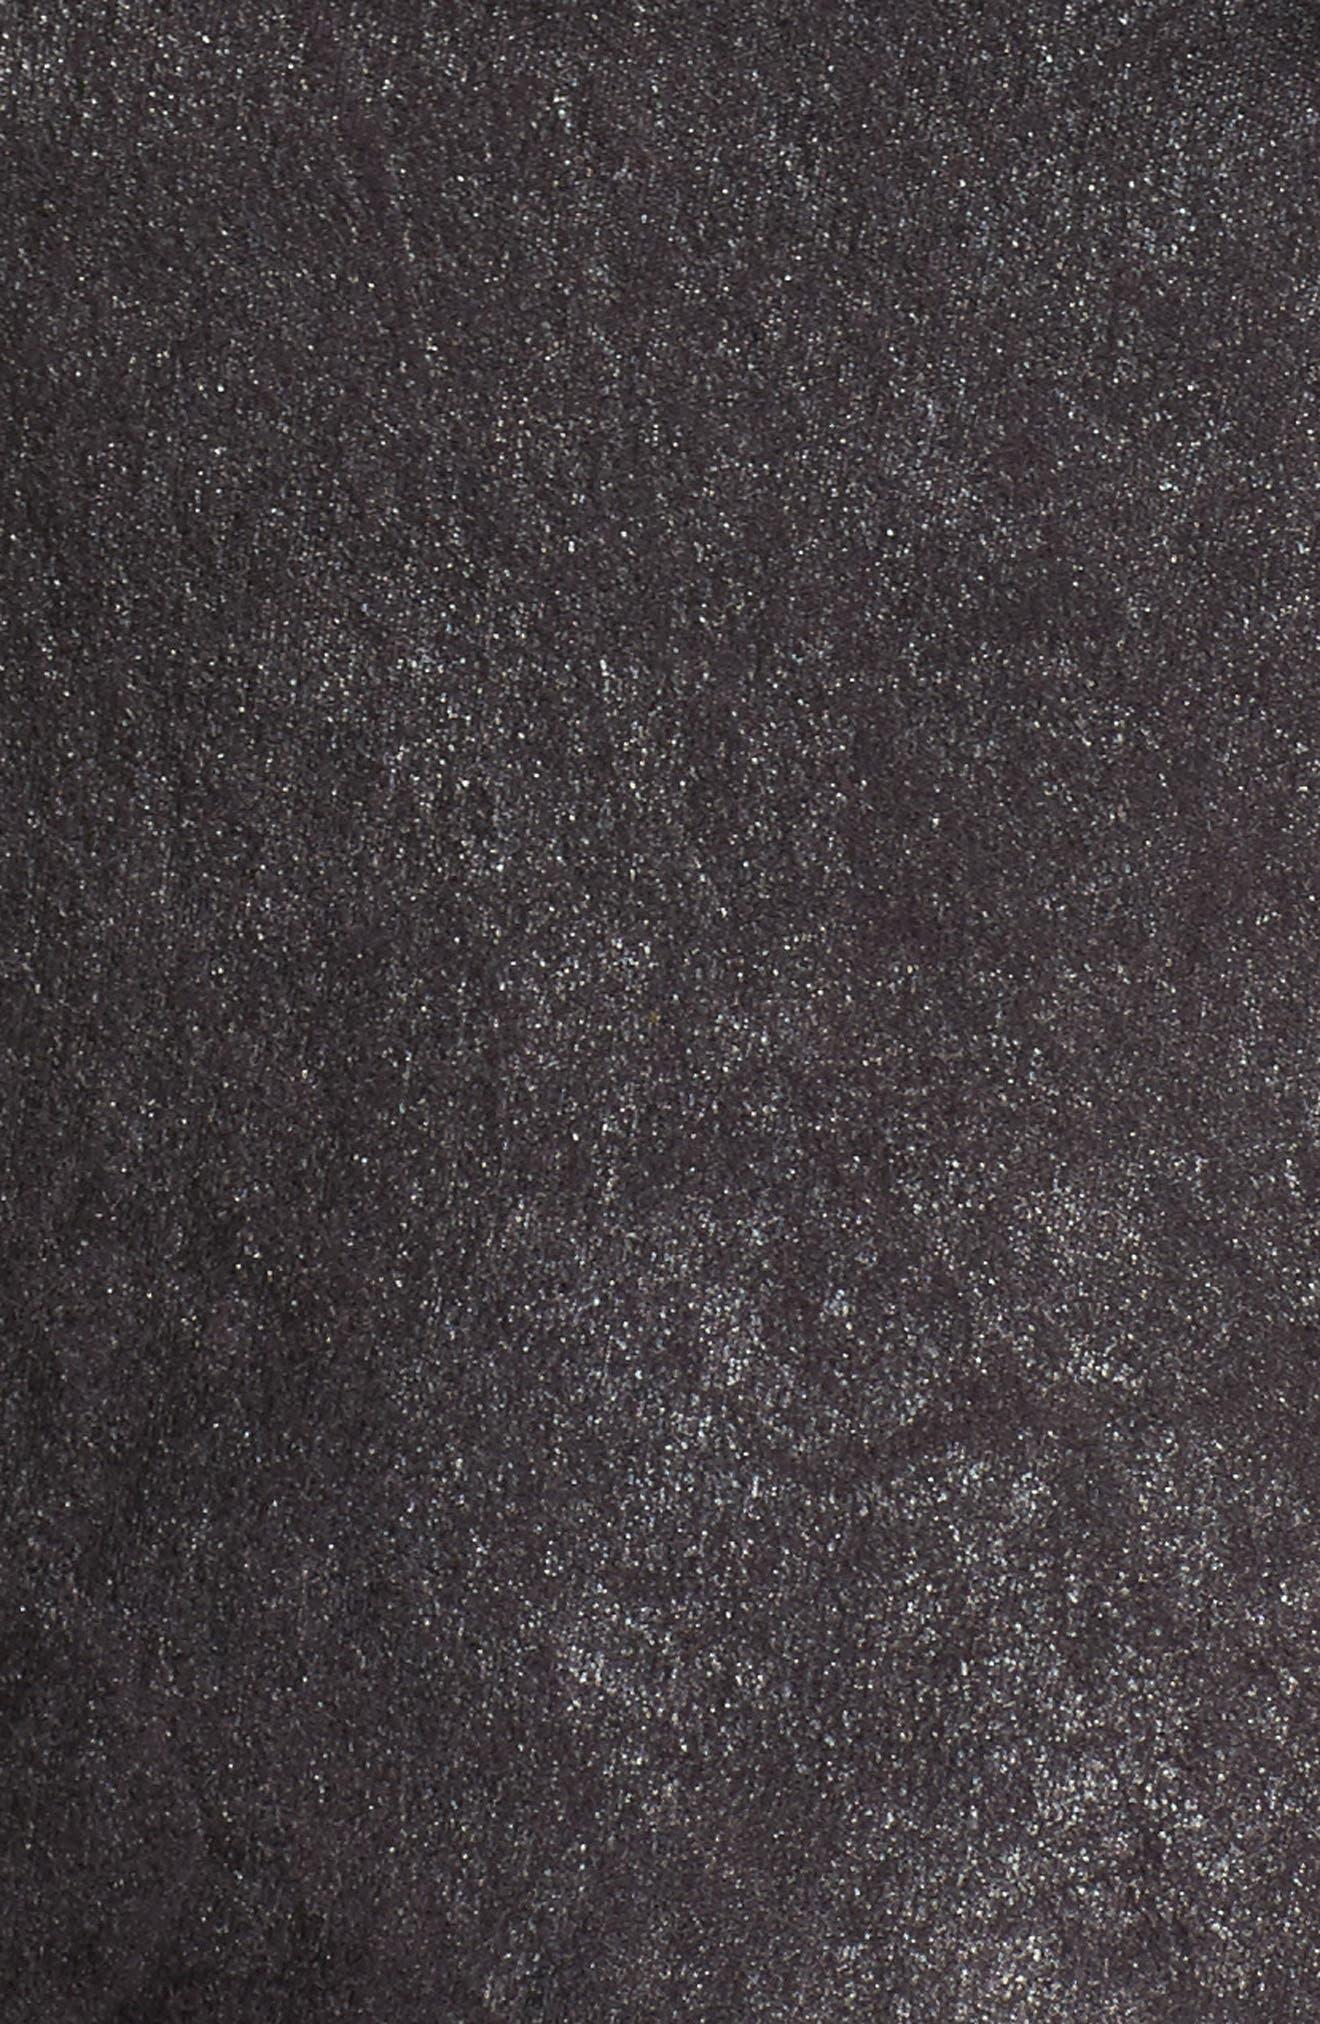 Alternate Image 4  - REBEL WILSON X ANGELS Asymmetrical Faux Leather Jacket (Plus Size)